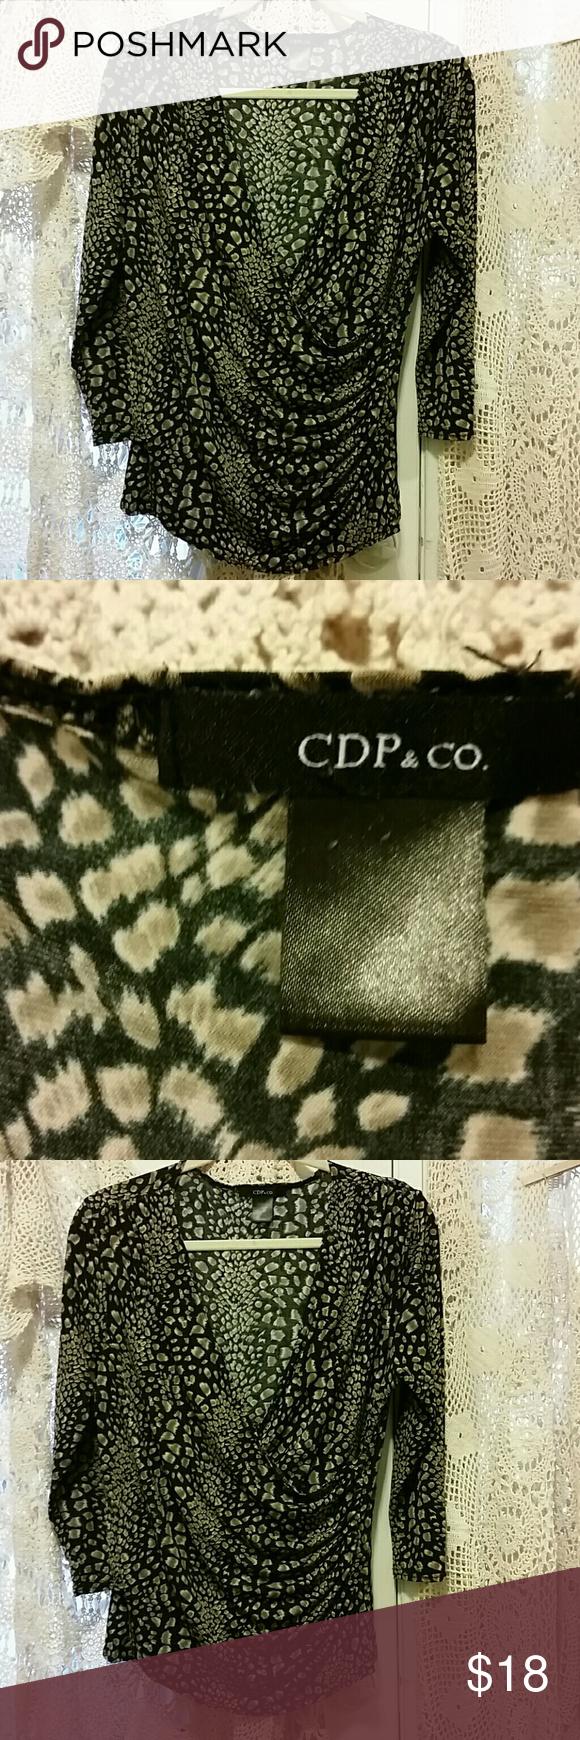 e371a3acae925f Vintage CPD&Co women's L Leopard print Brown Vintage brown and black leopard  print CPD & Company women's top flattering wrap front size large  three-quarter ...